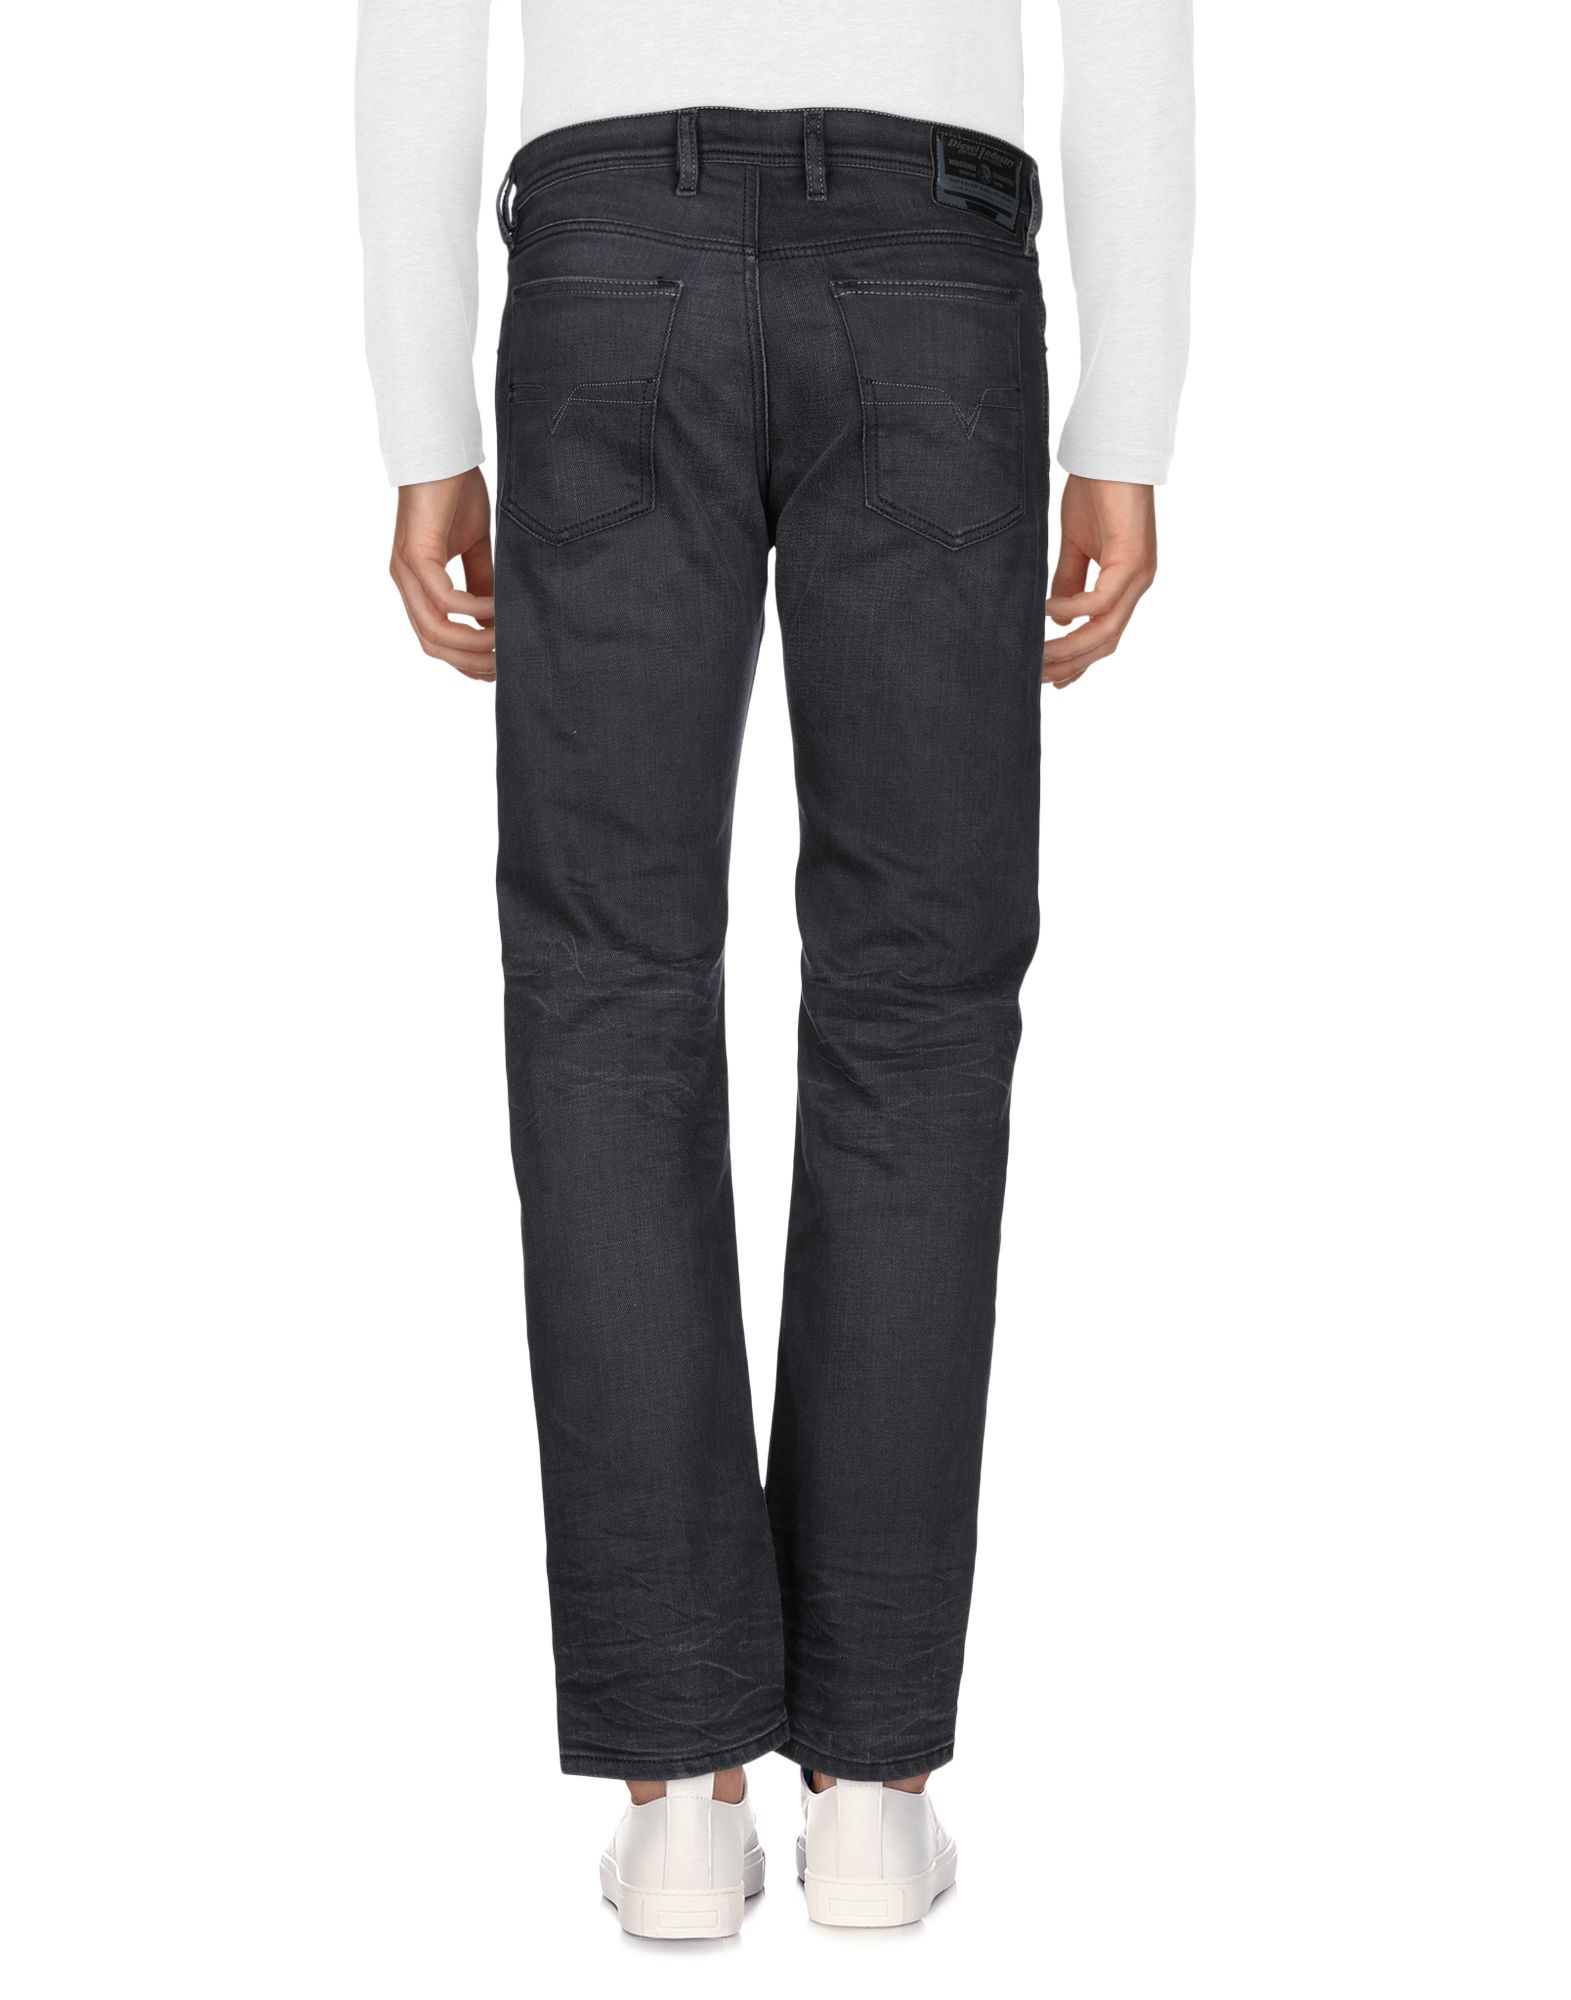 Pantaloni Diesel Jeans Diesel Pantaloni Uomo - 42687609AS 20ae14